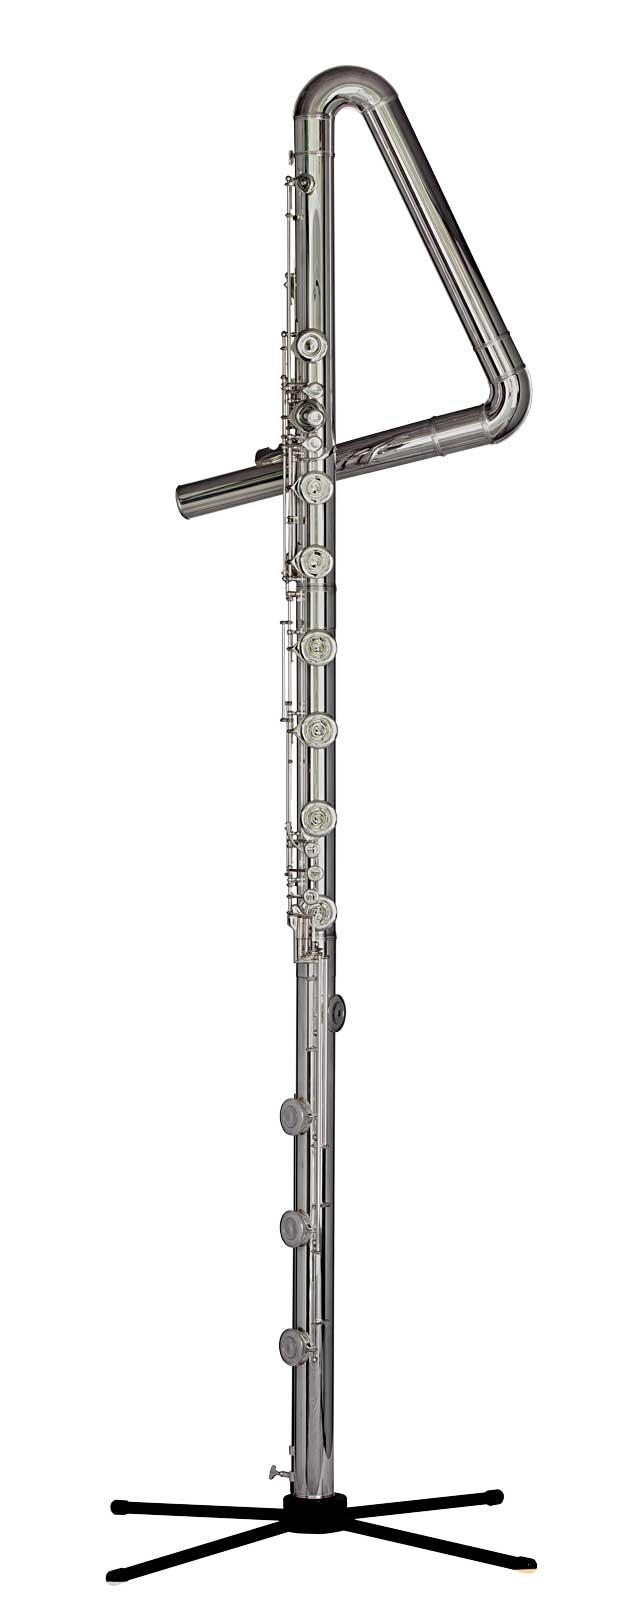 Introduction Contrabass flute